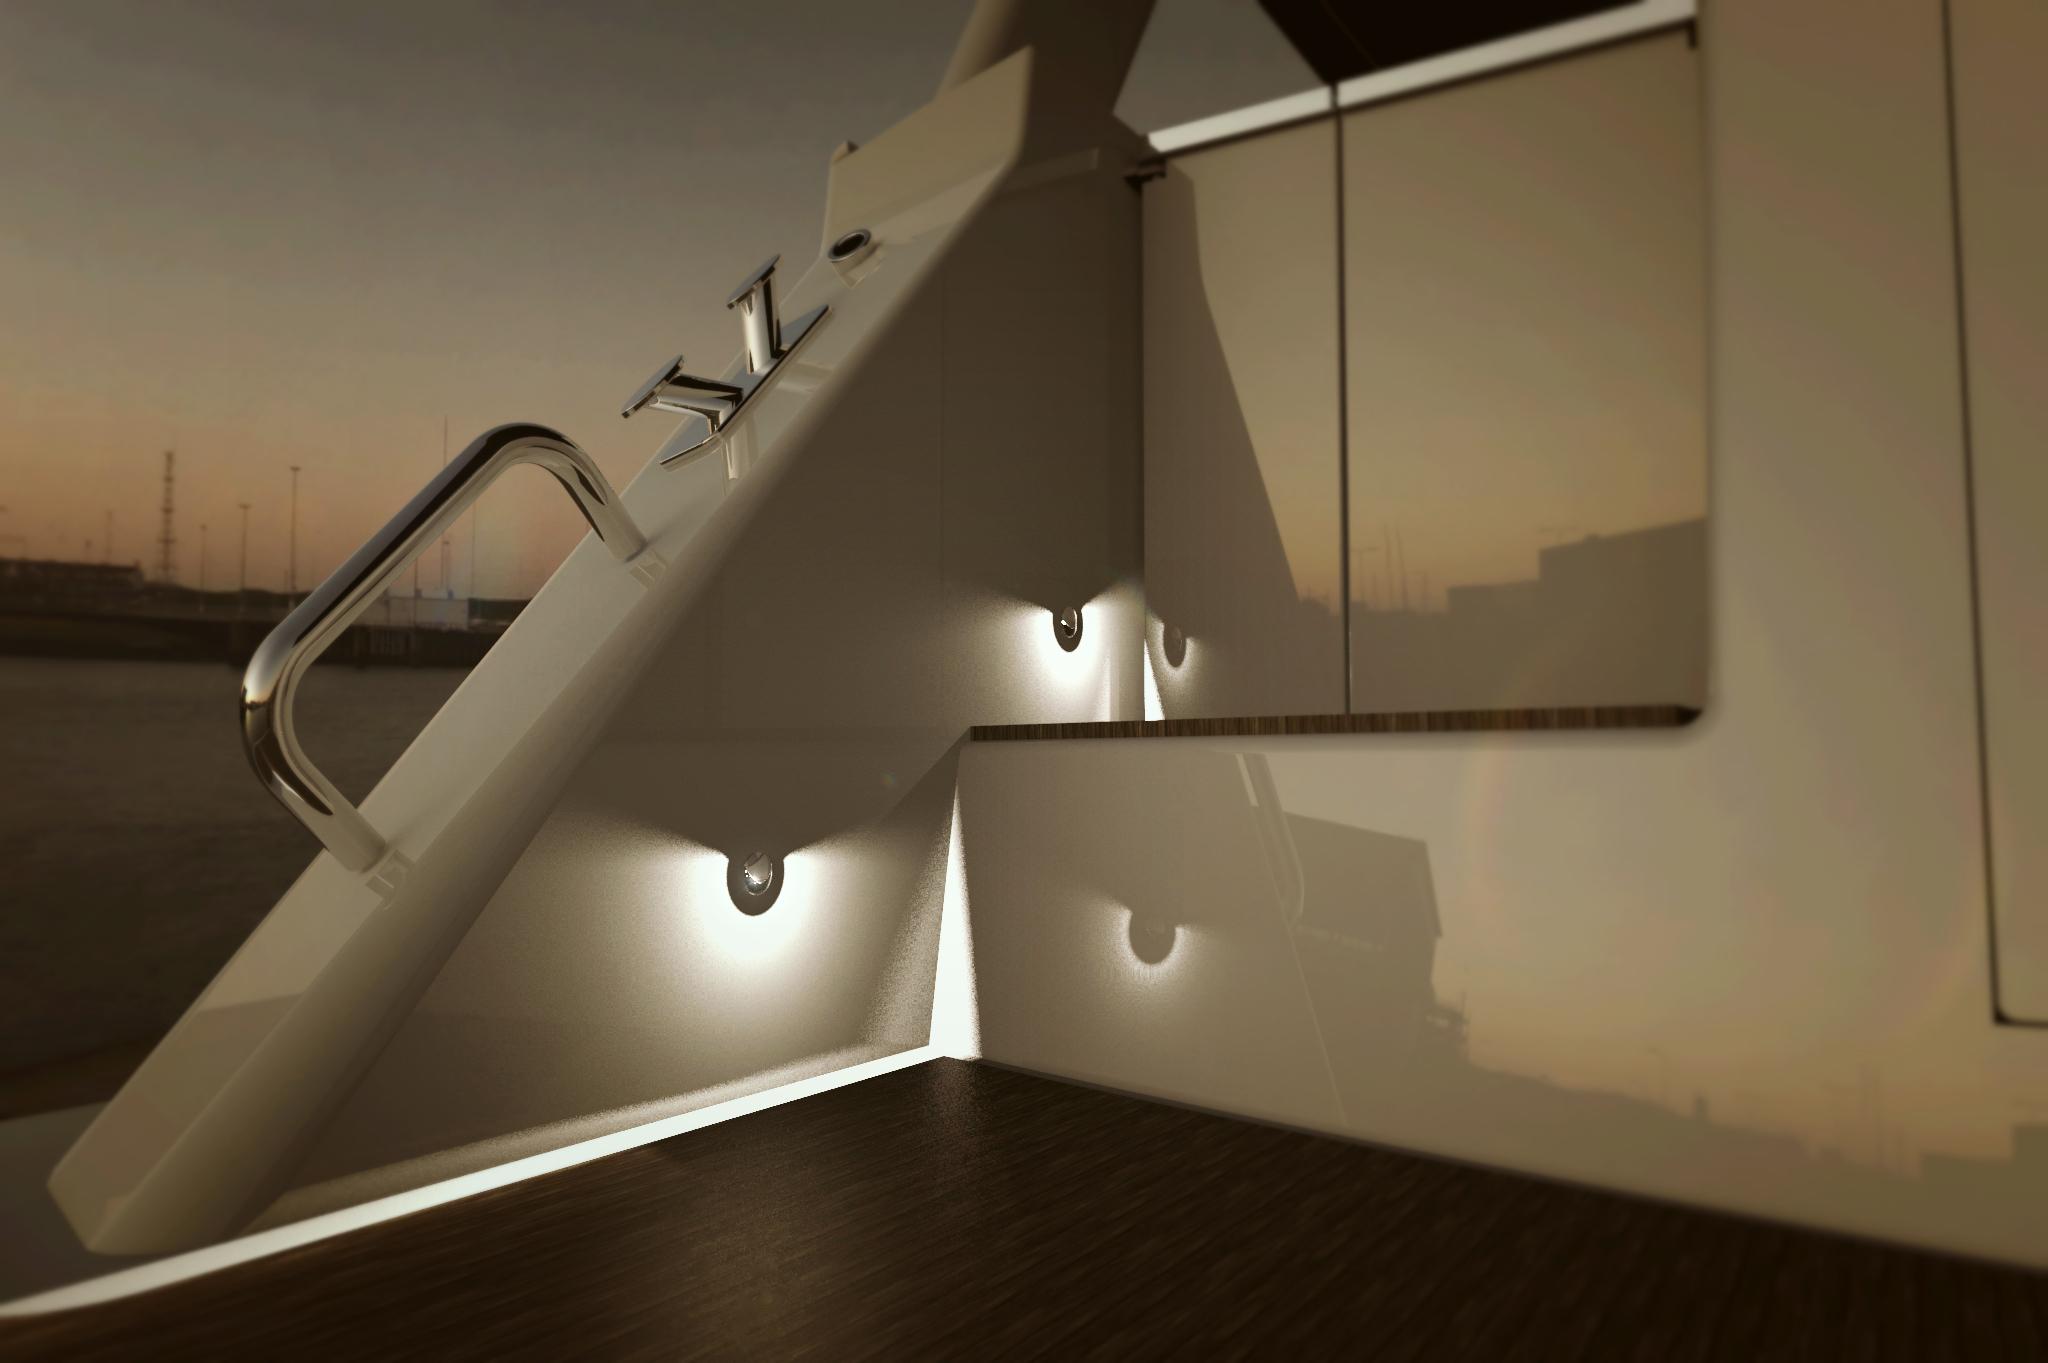 cassandra step light led marine lighting and accessoriesled marine lighting and accessories. Black Bedroom Furniture Sets. Home Design Ideas